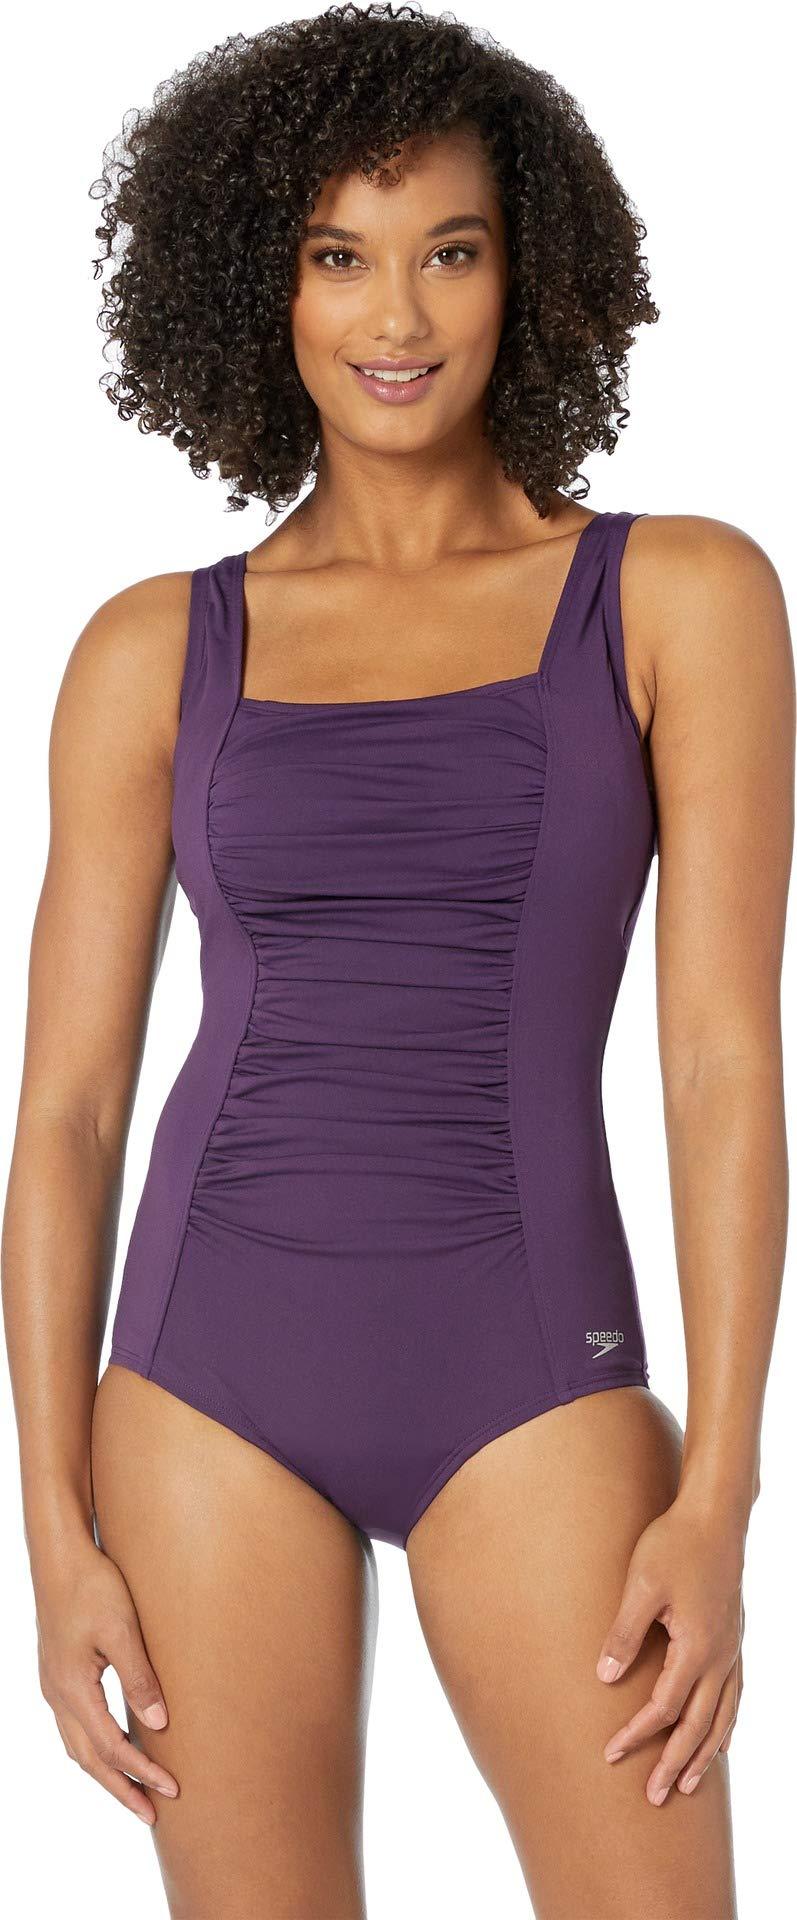 Speedo Women's Endurance+ Shirred Tank Onepiece Swimsuit, Gravity, 6